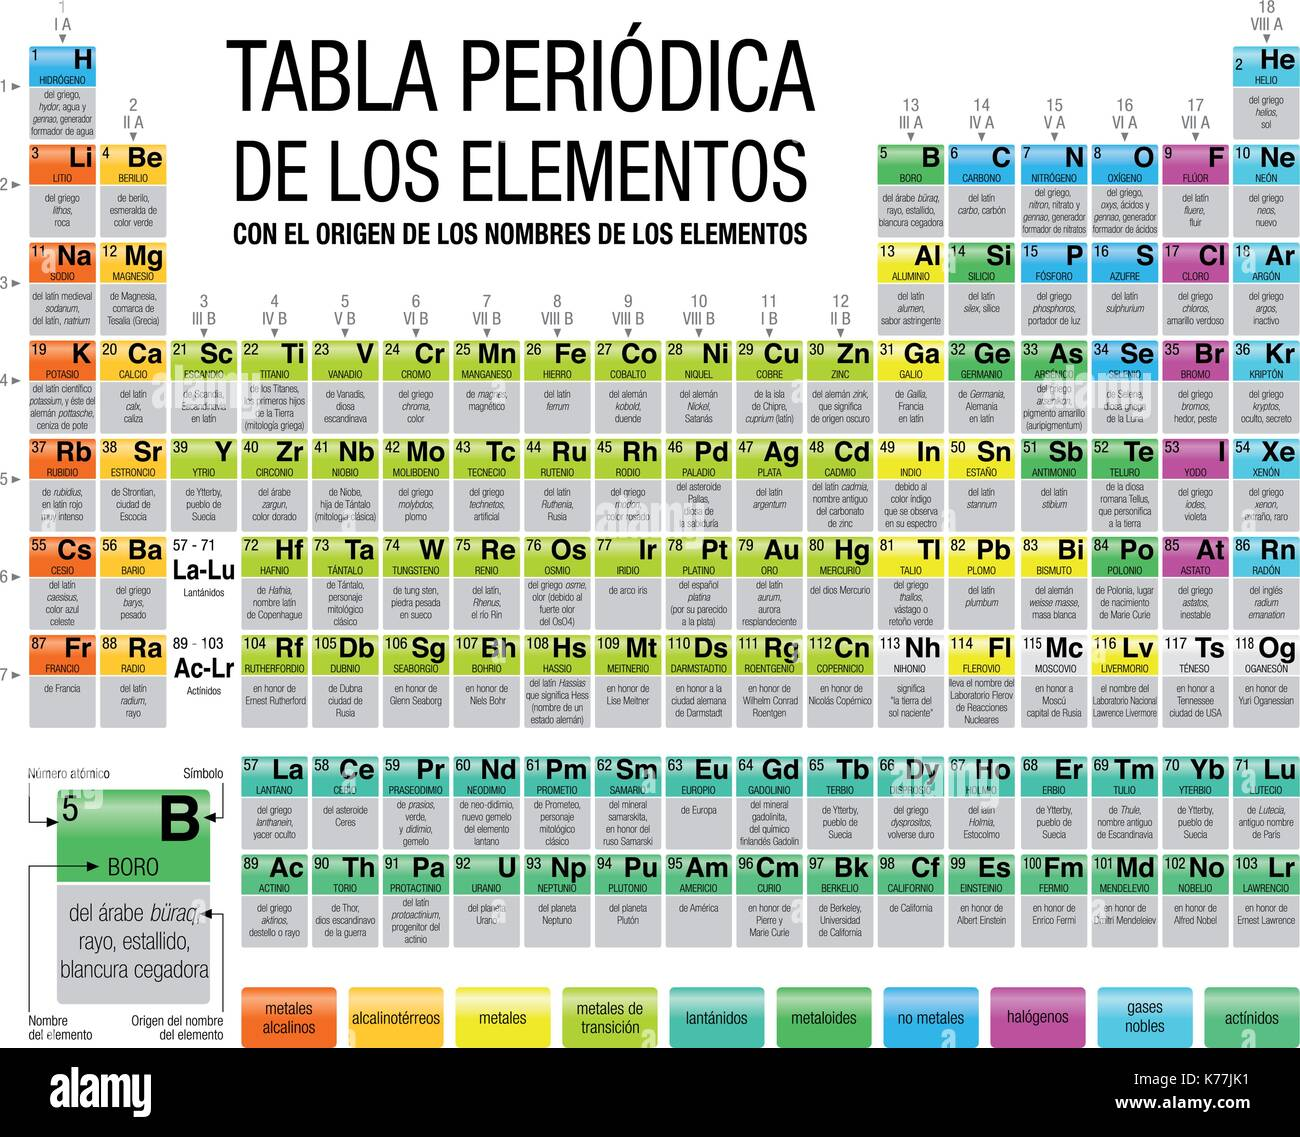 Tabla peridica de los elementos con el origen de los nombres de tabla peridica de los elementos con el origen de los nombres de los elementos periodic table of elements with the origin of the names of the element urtaz Images